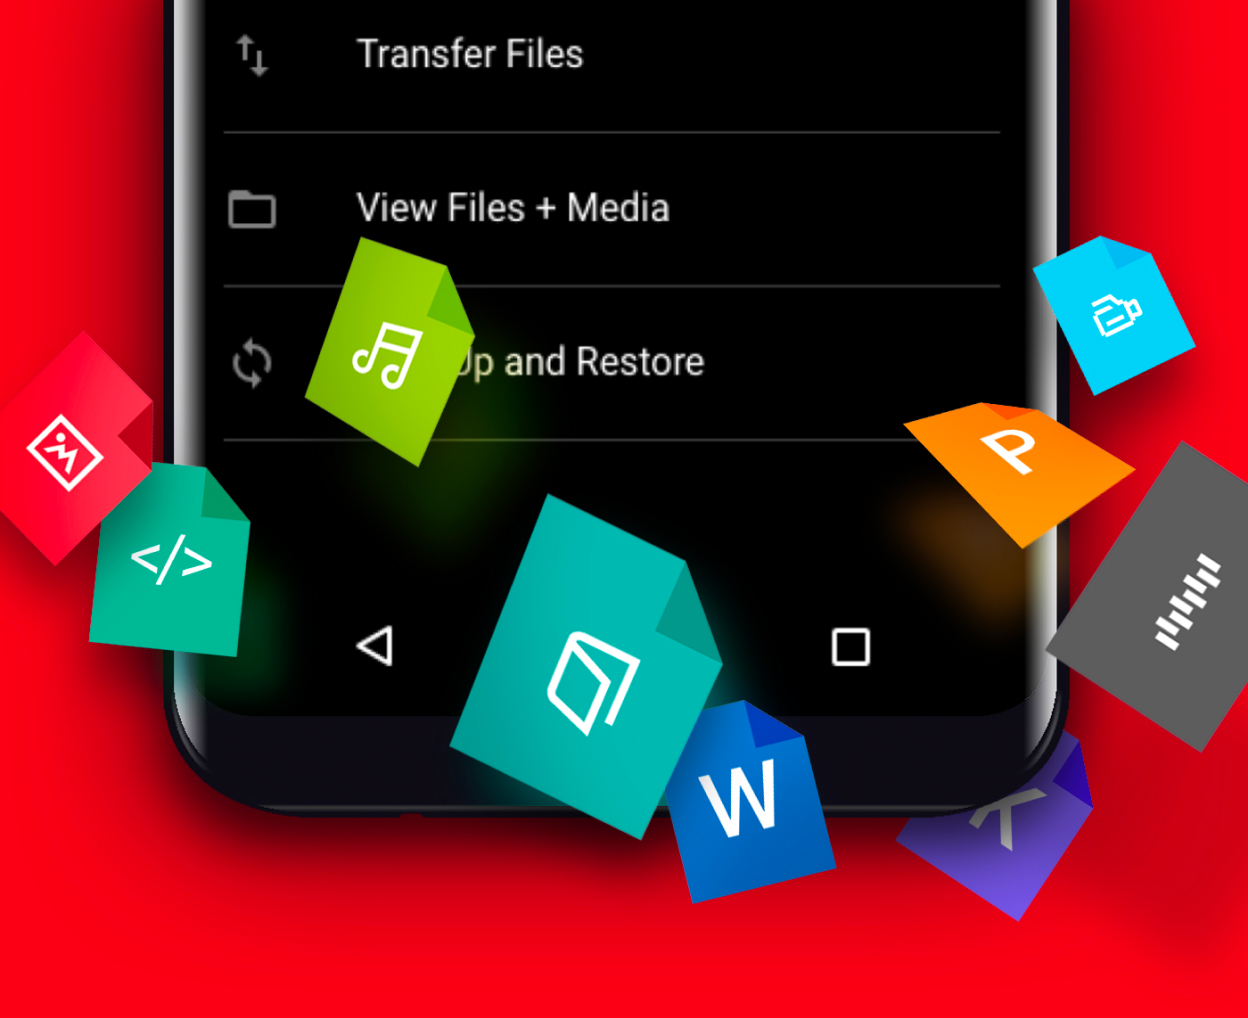 Improve Sandisk iXpand drive's performance